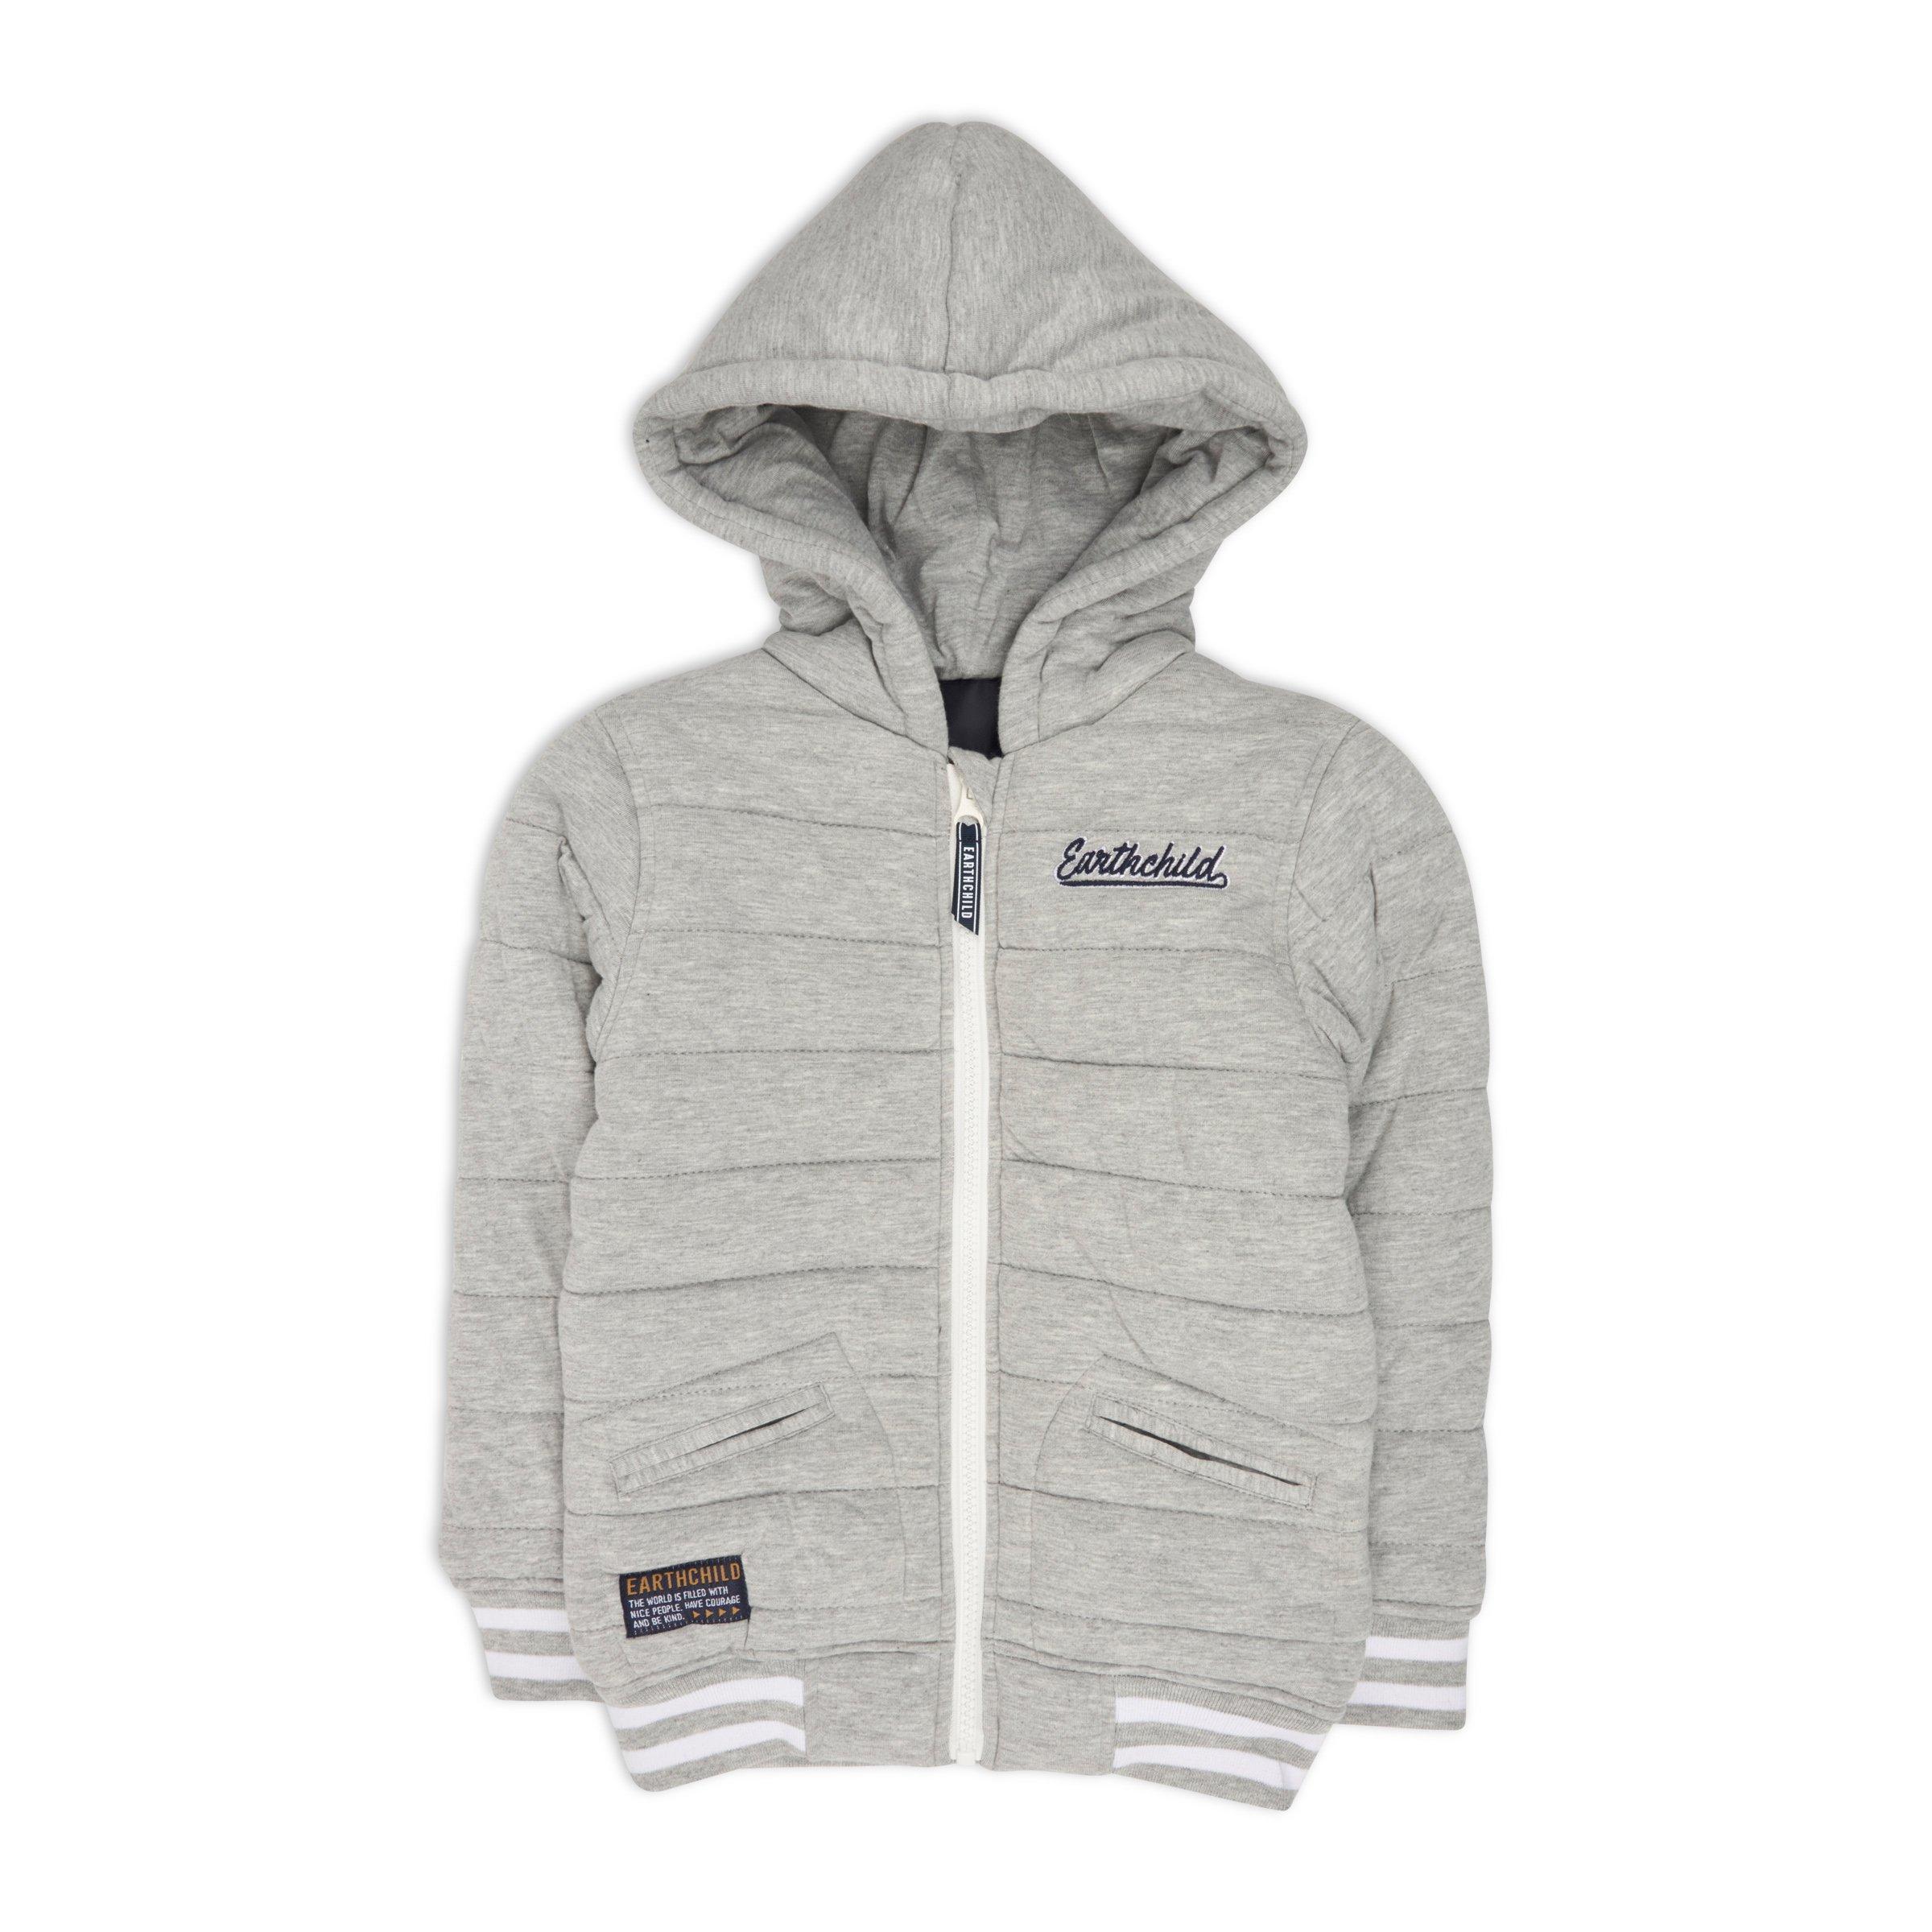 0f402035b7f29 Boys Grey Fleece Jacket